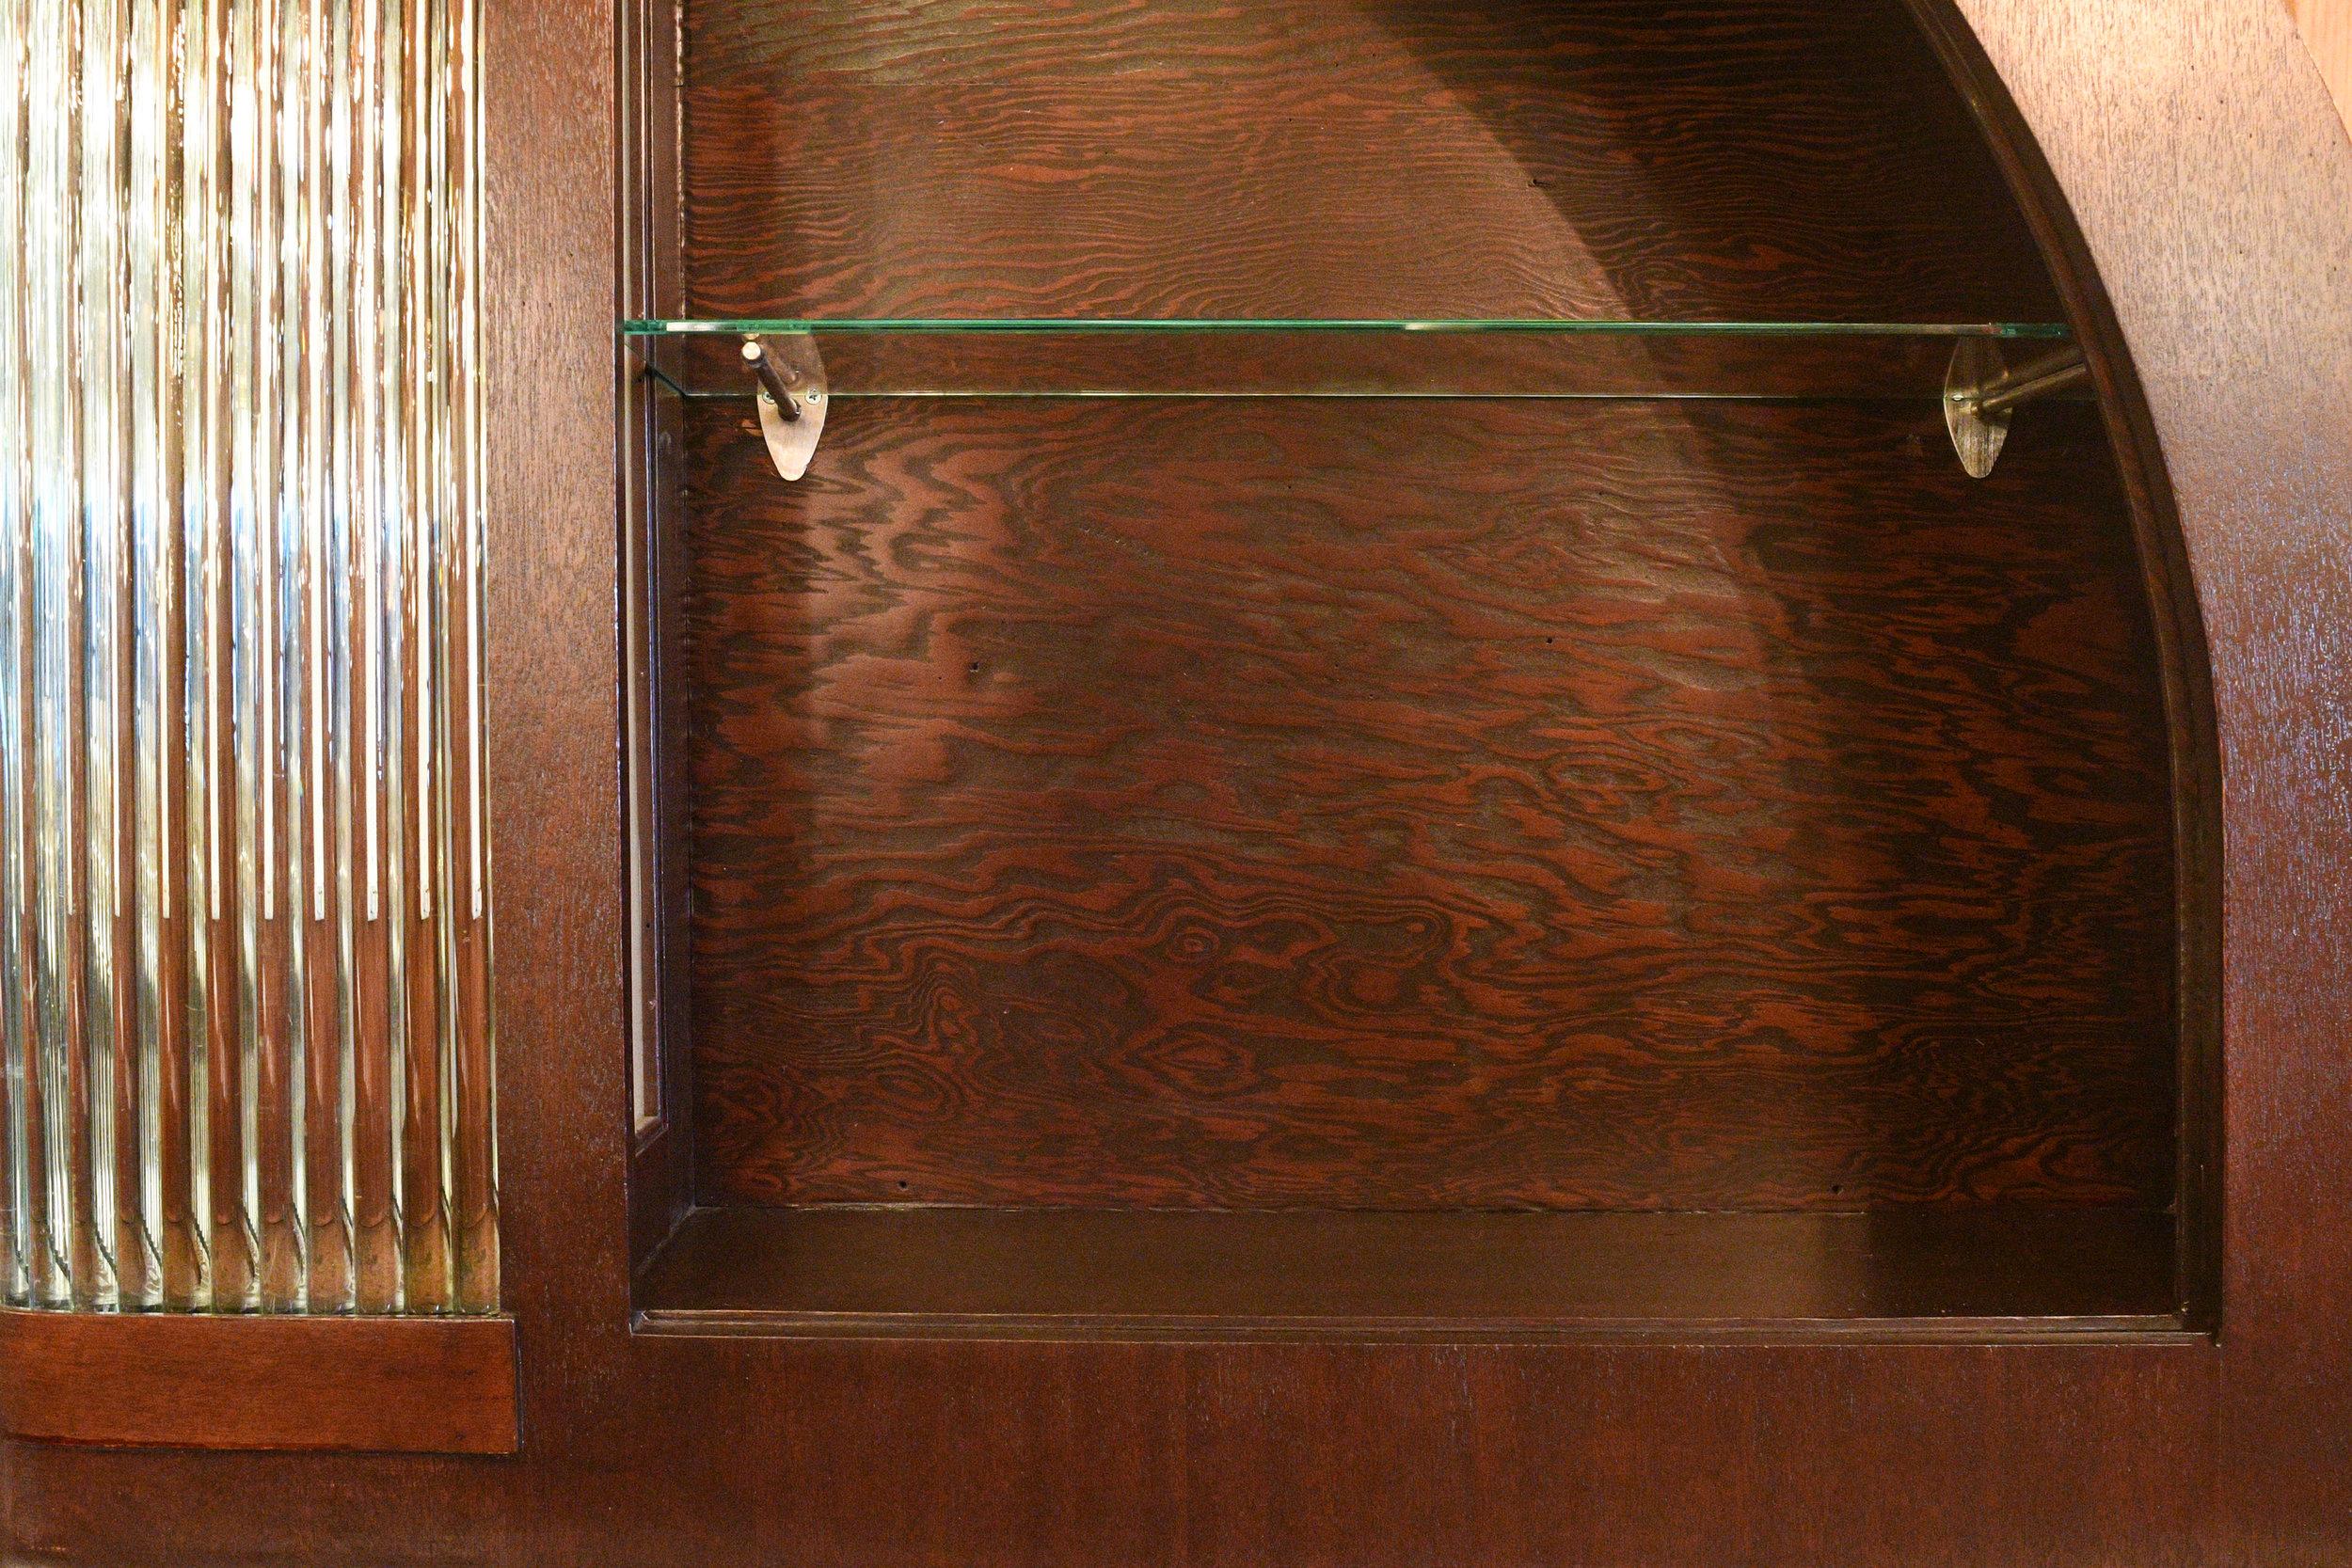 47687-art-deco-bar-with-glass-rods-details-1.jpg